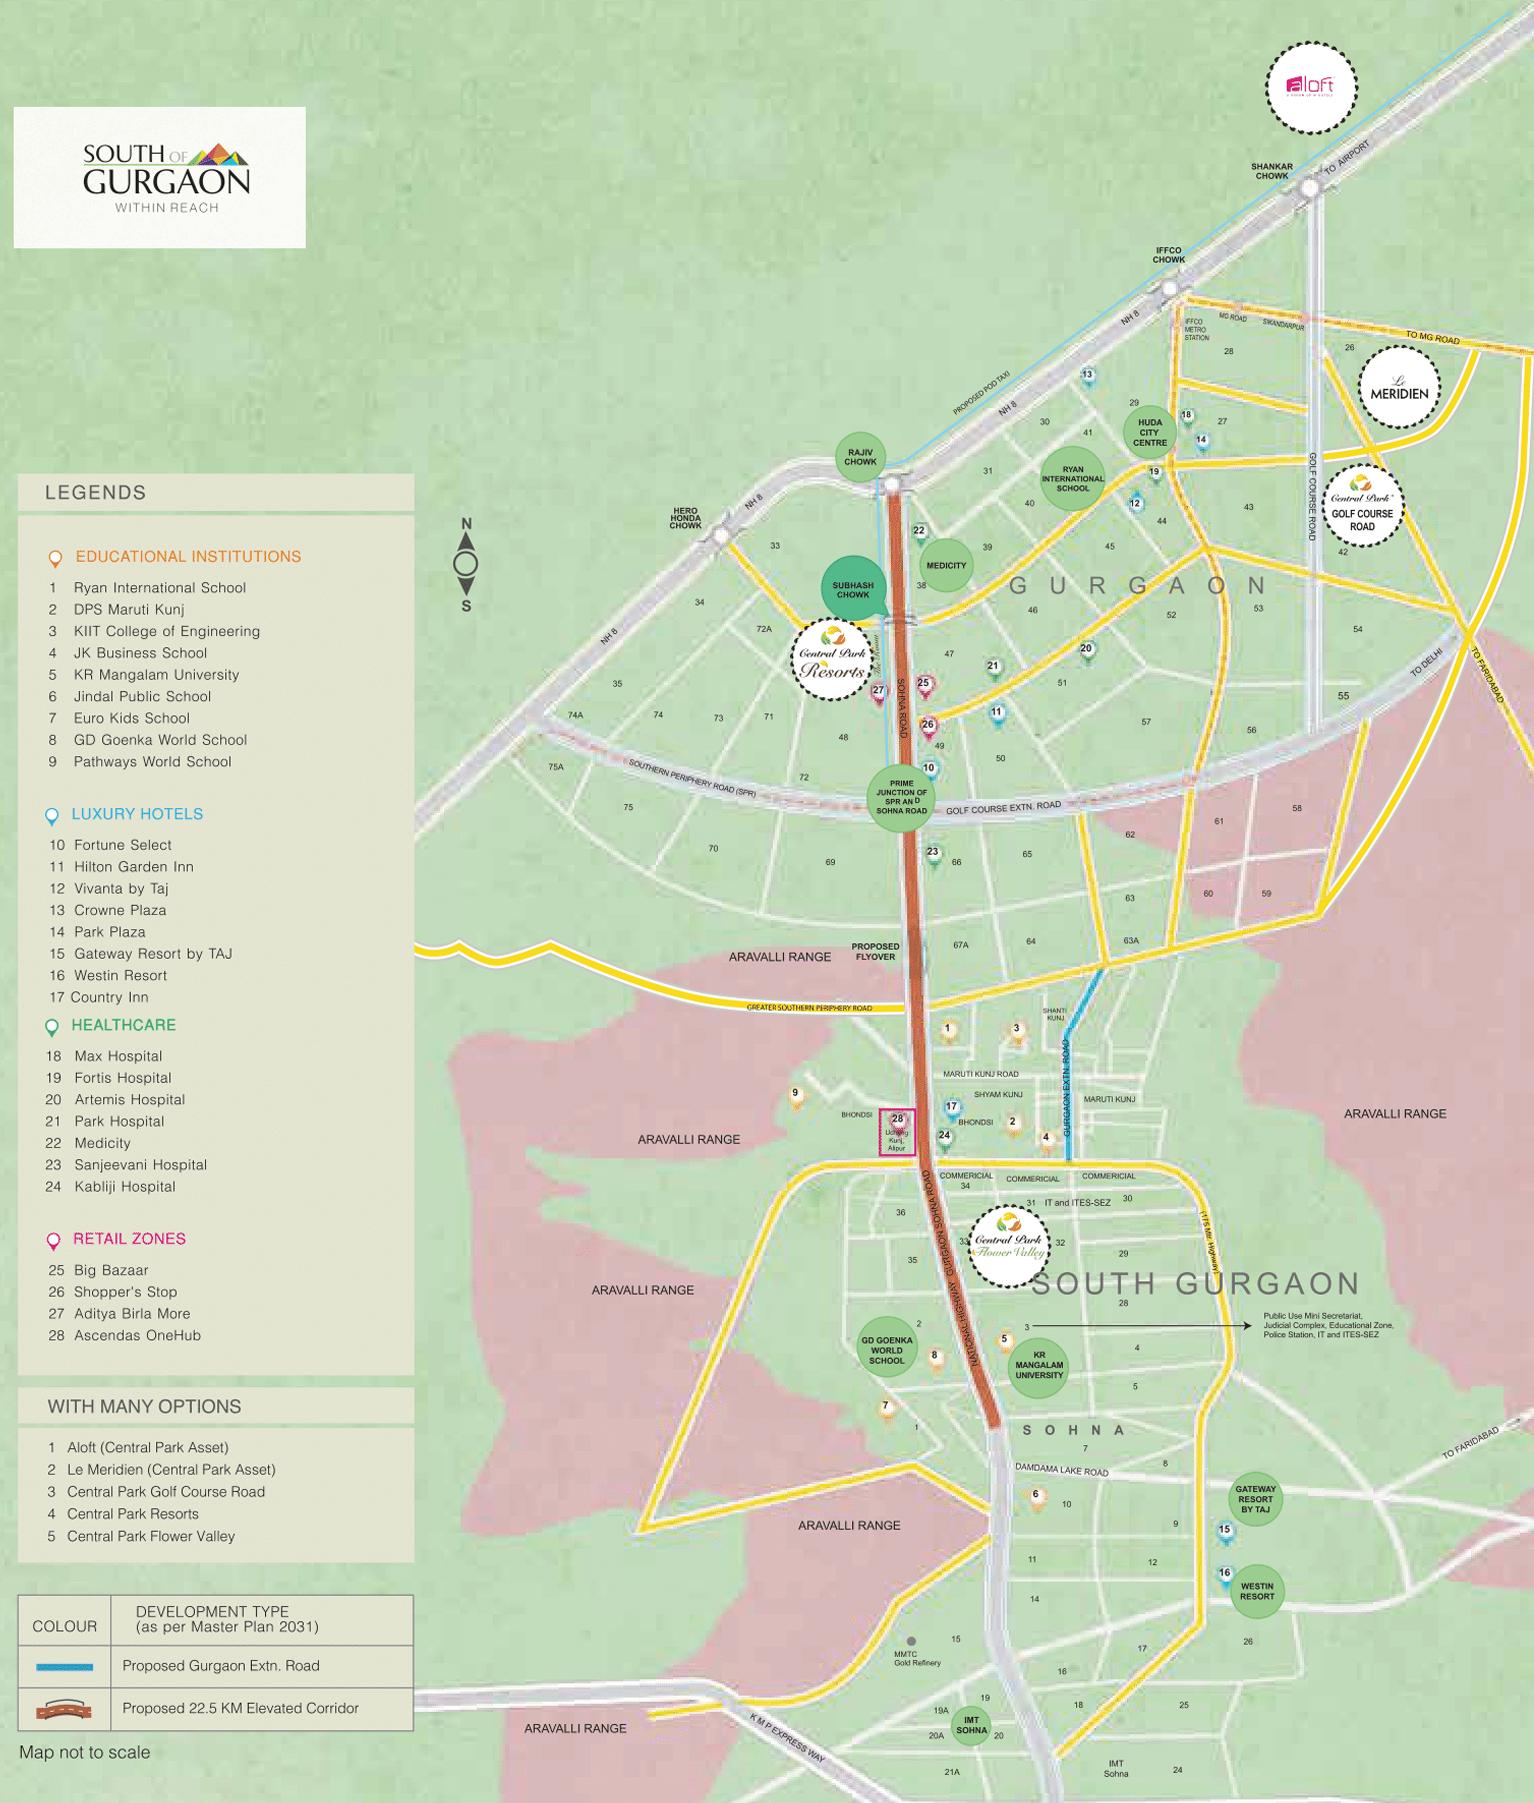 aqua front tower location map